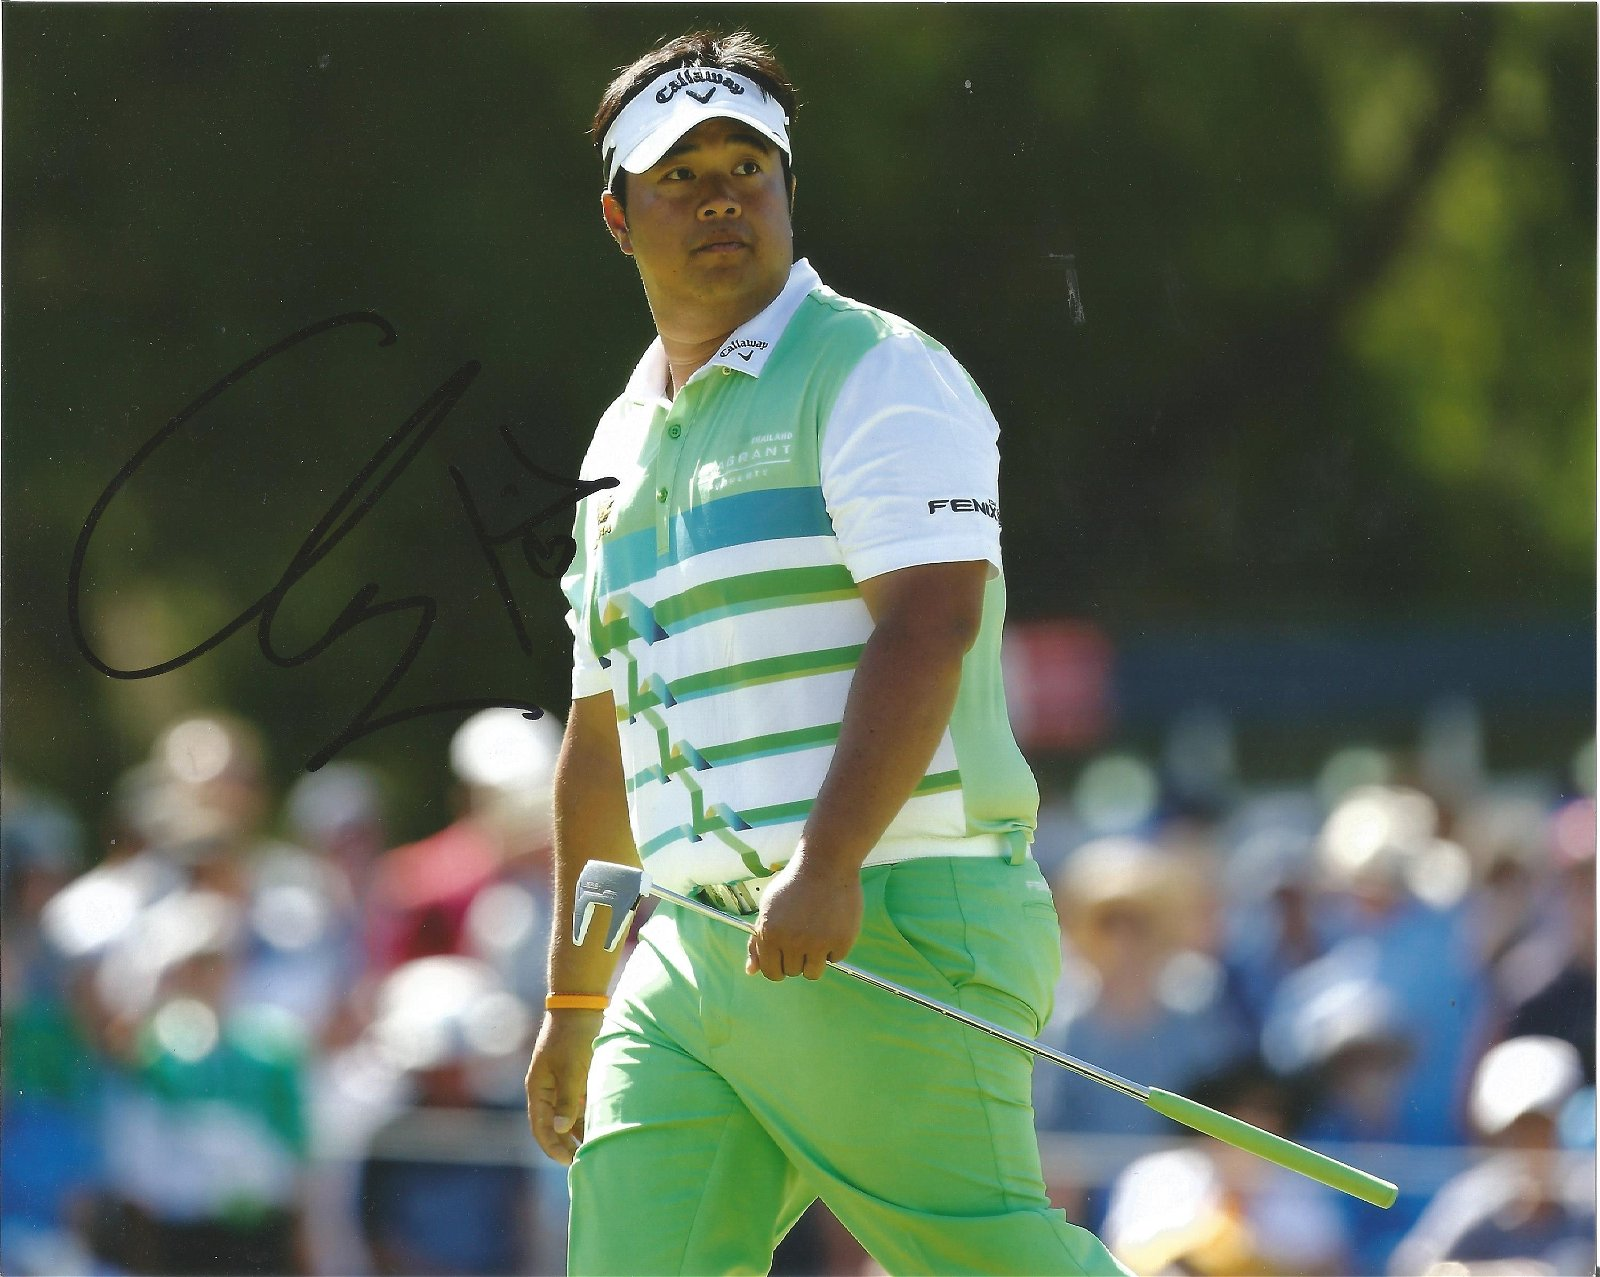 Kiradech Aphibarnrat Signed Golf 8x10 Photo . Good